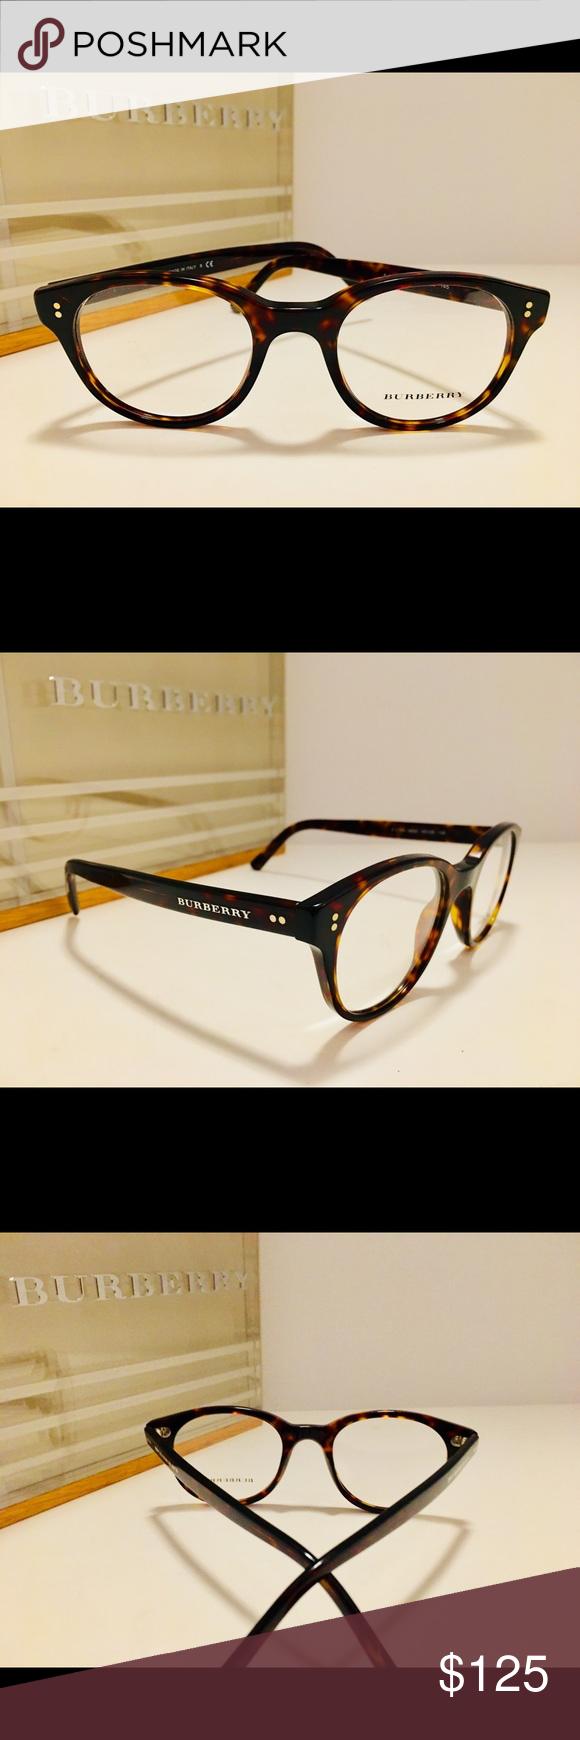 77de6e9a93 Burberry Eyeglasses B2194 Dark Havana Round Size  48-20-145 Unisex Demo Lens  Rx-Able Frame Only (no case) Burberry Accessories Glasses